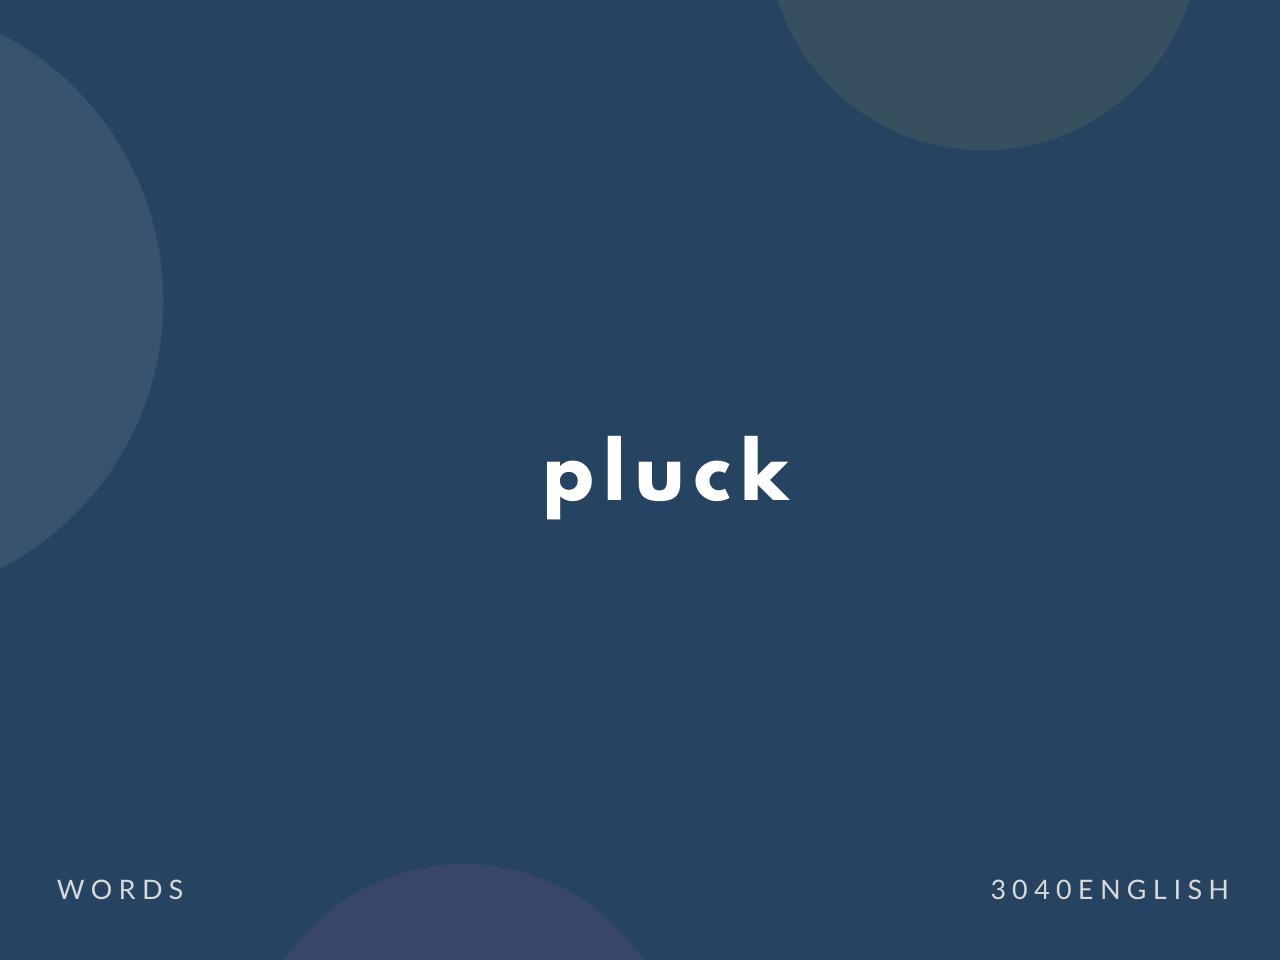 pluck の意味と簡単な使い方【音読用例文あり】